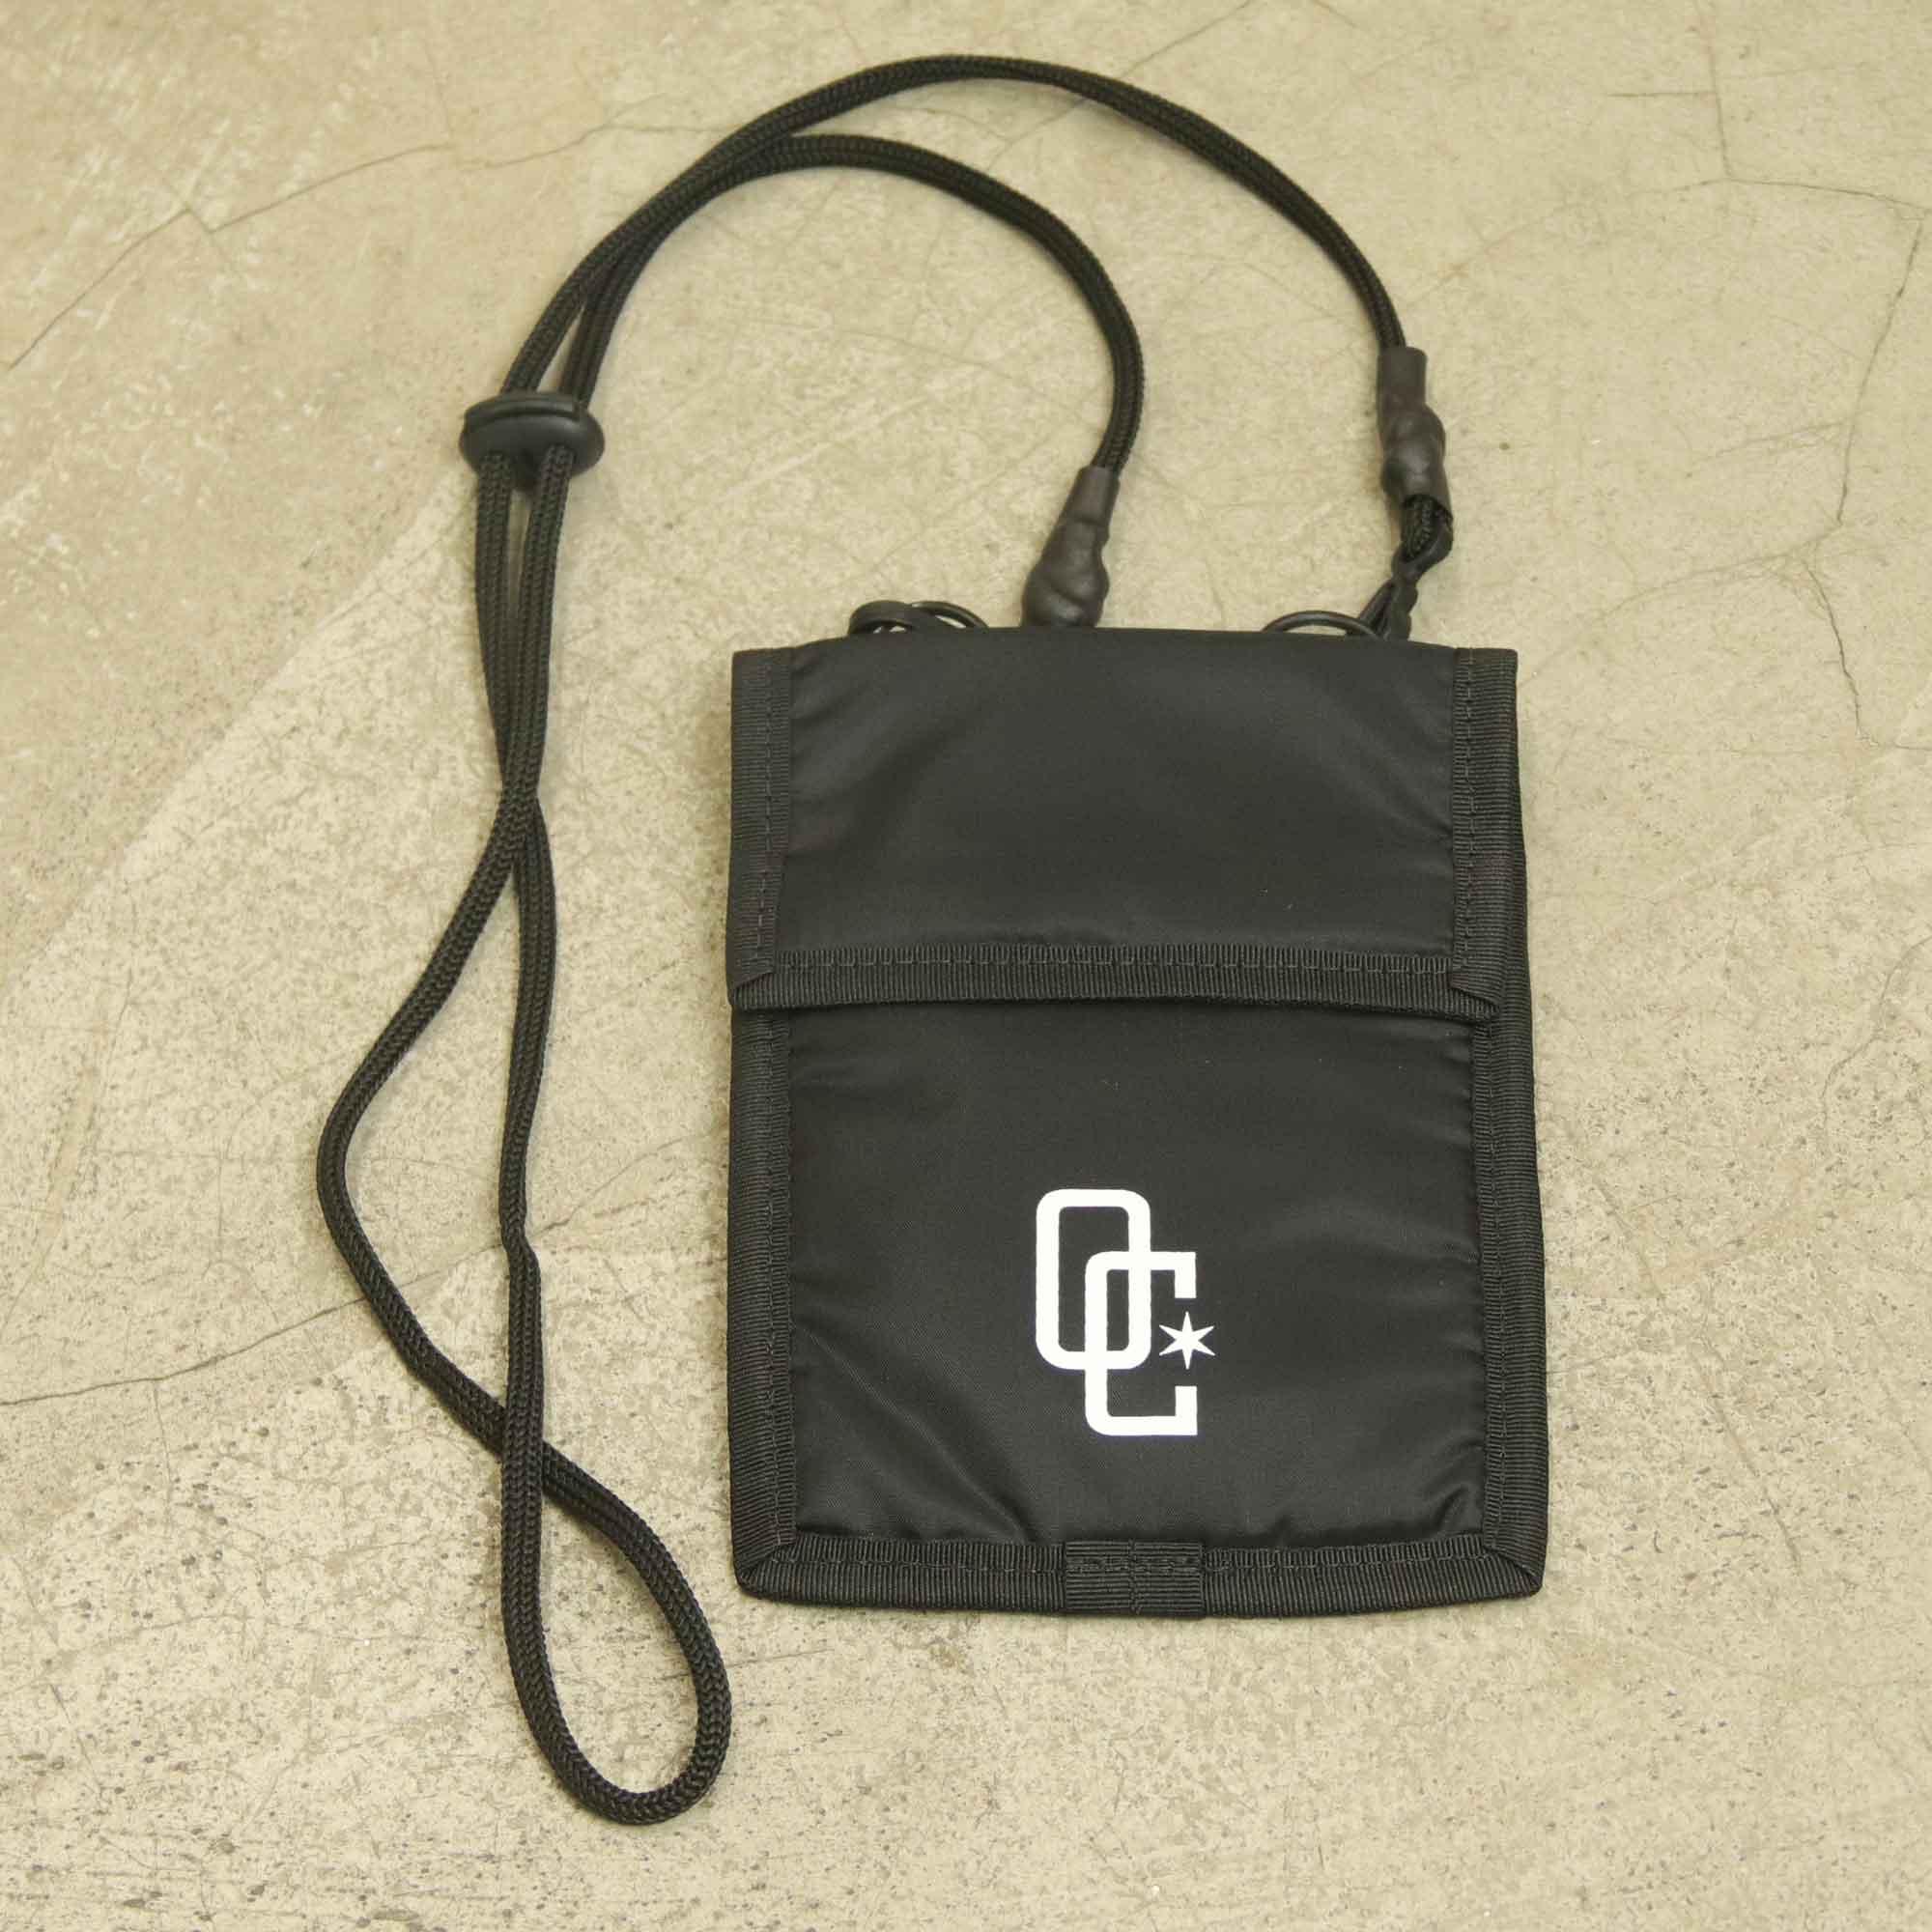 Pouch Bag Overcome